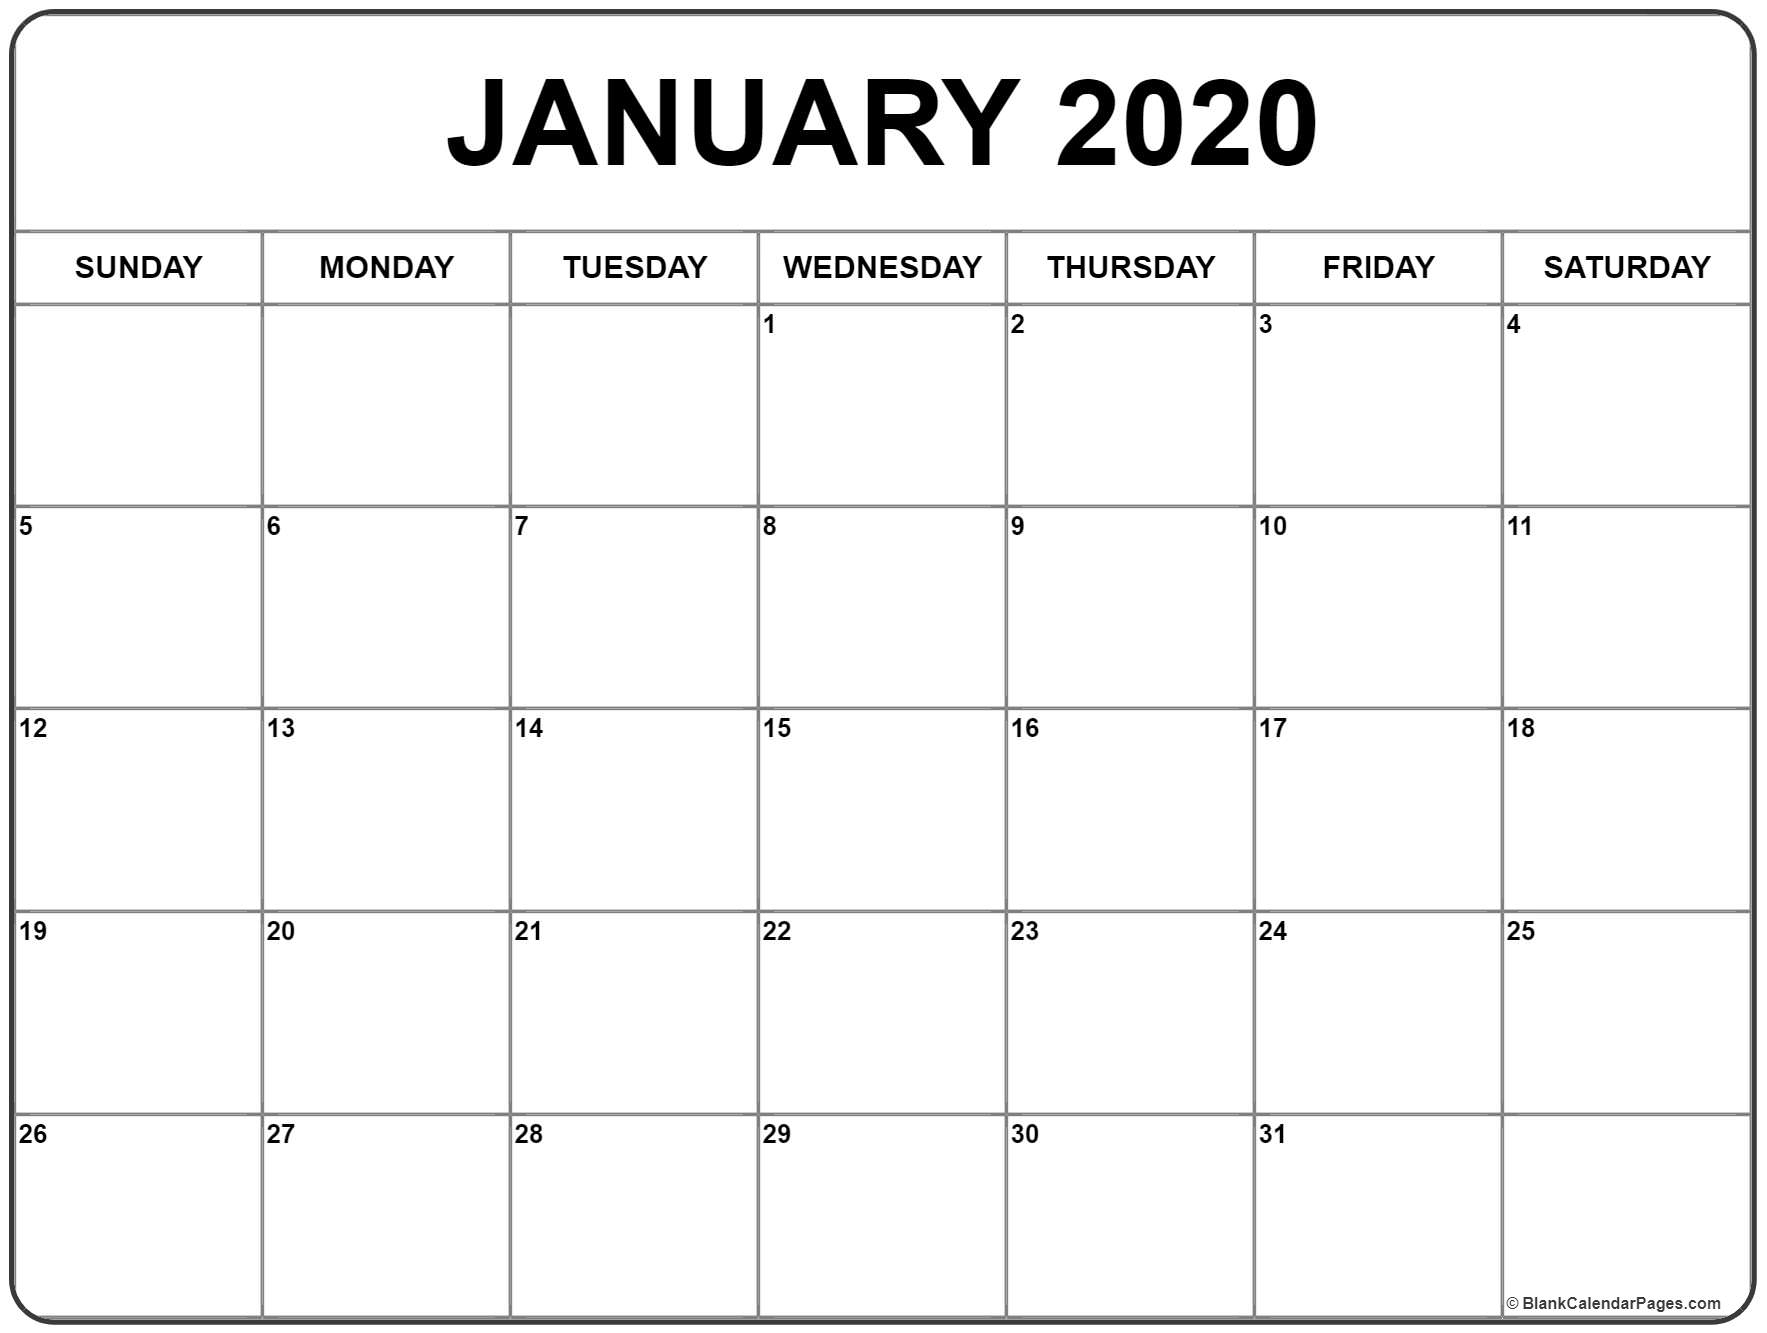 Large Box Printable Calendar 2020 Google - Calendar with regard to Large Box Printable 2020 Calendar